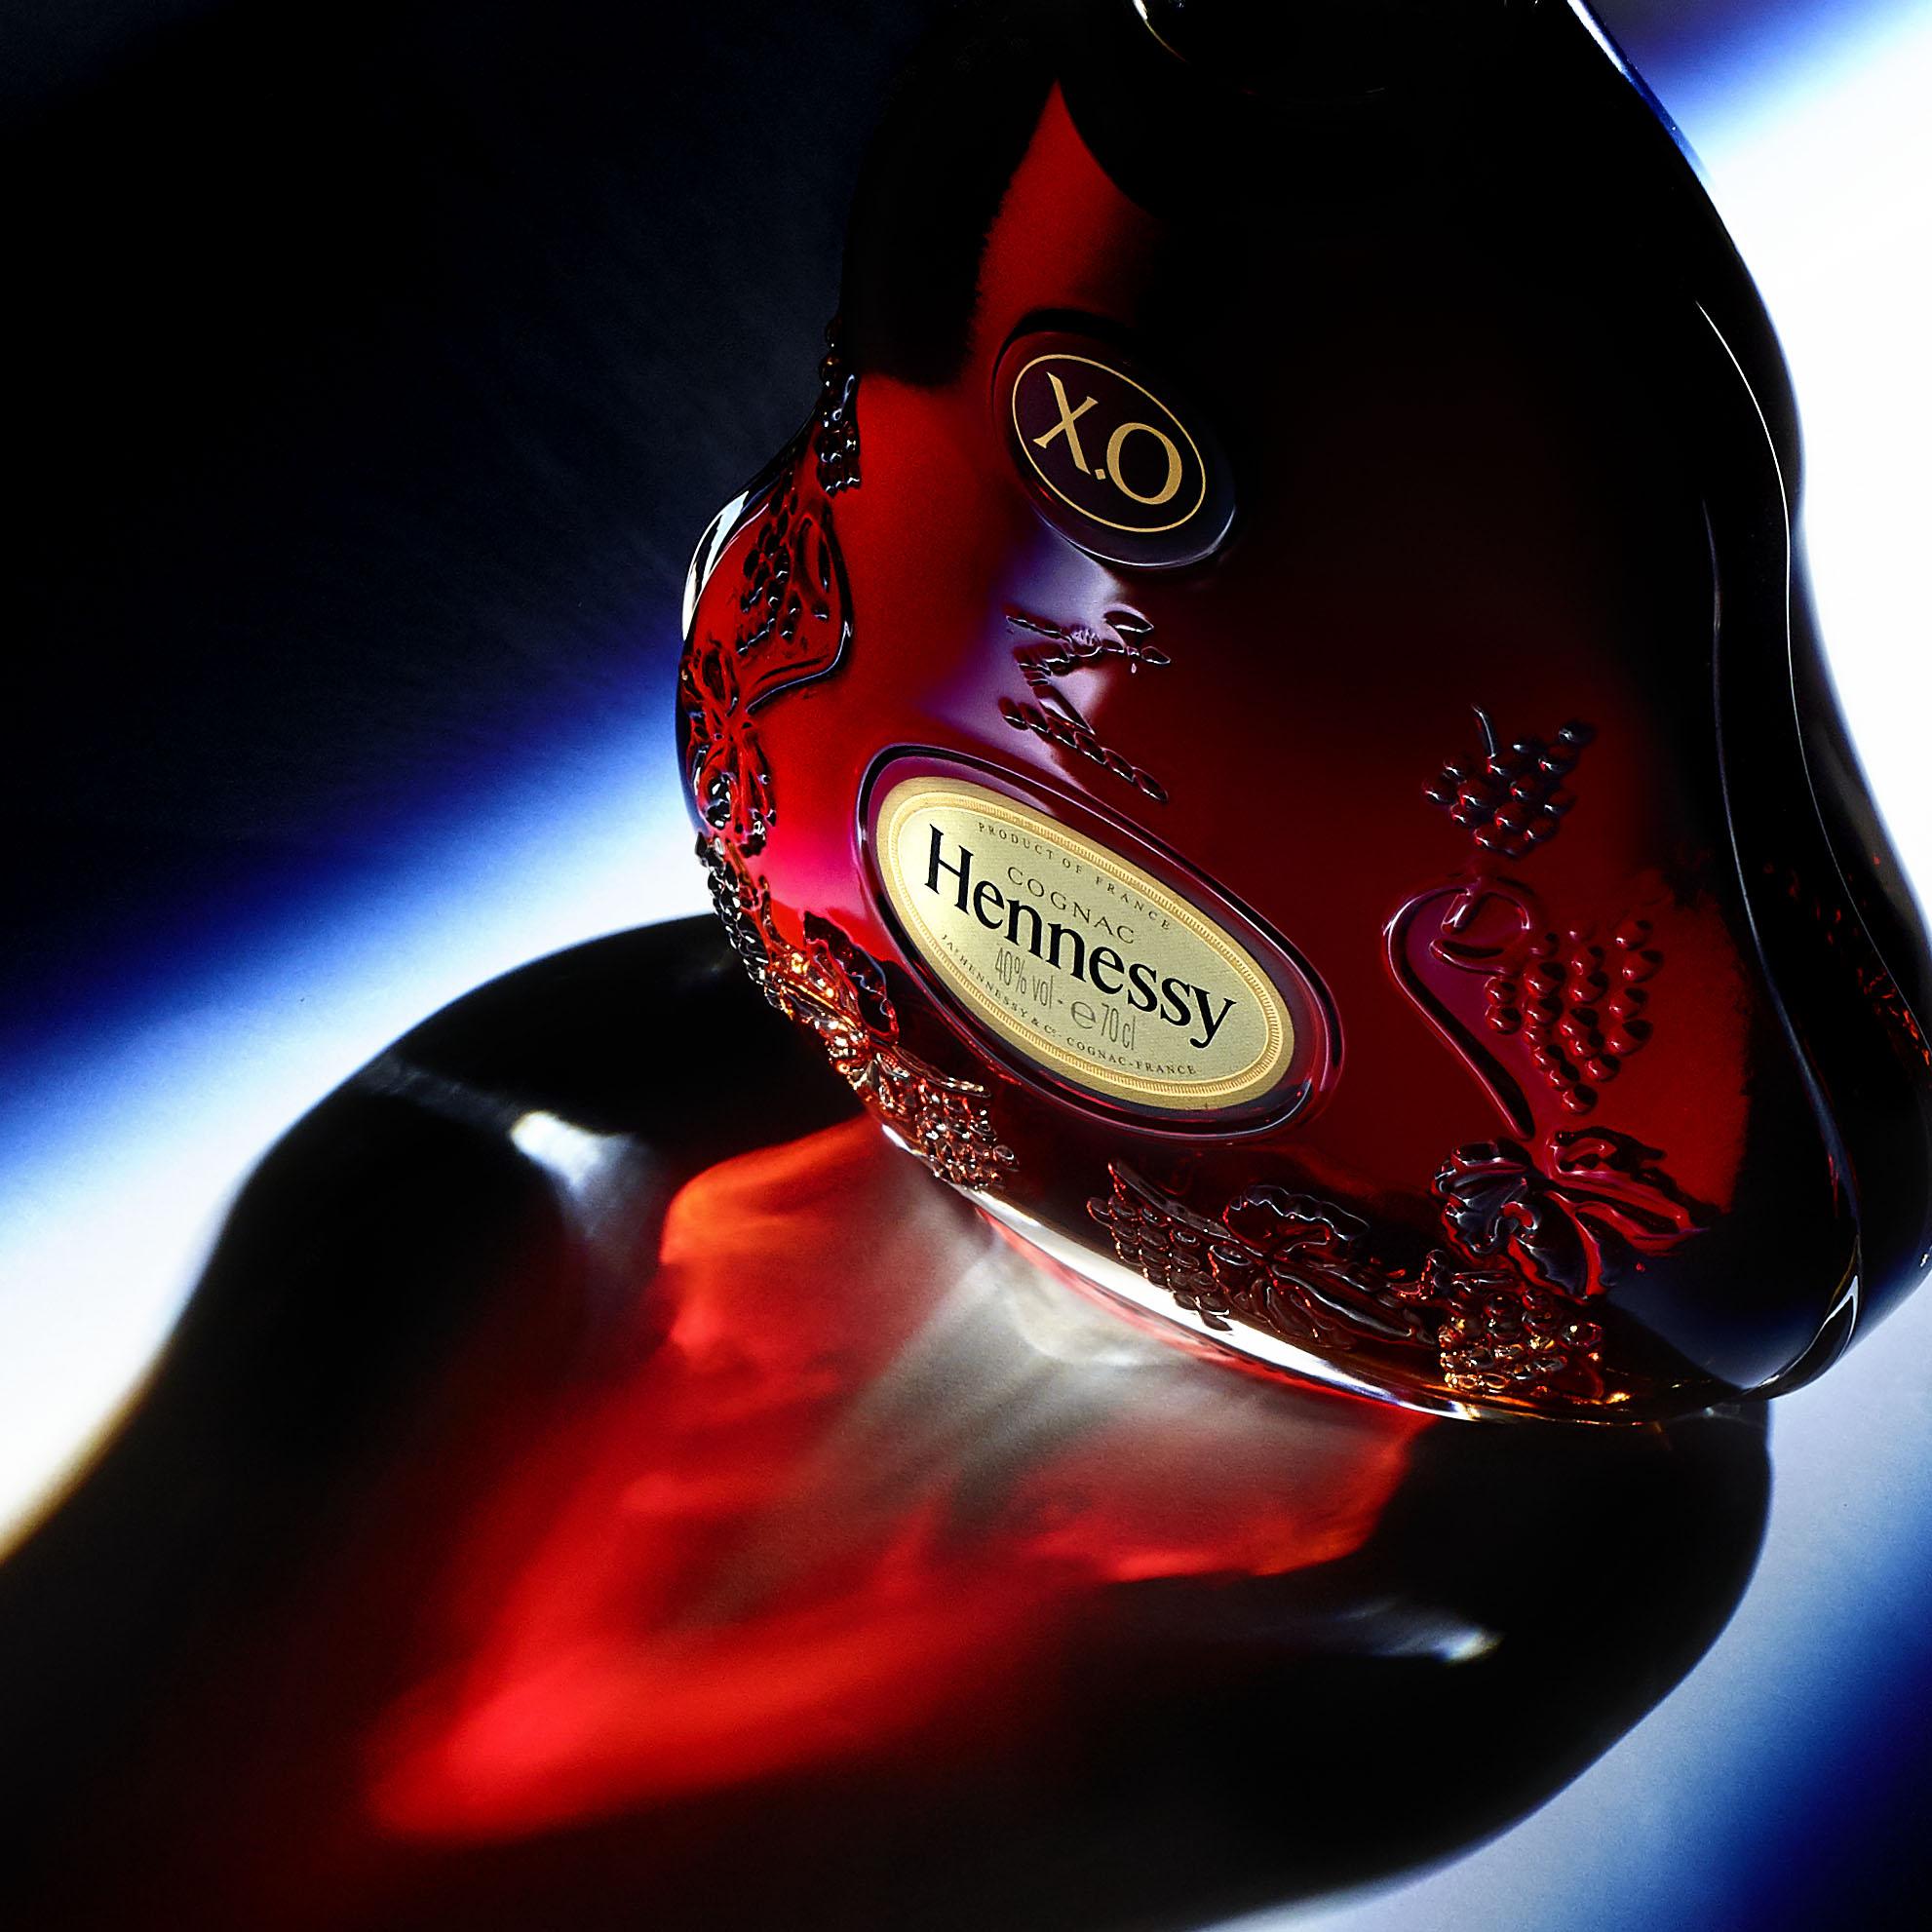 The comeback of Cognac